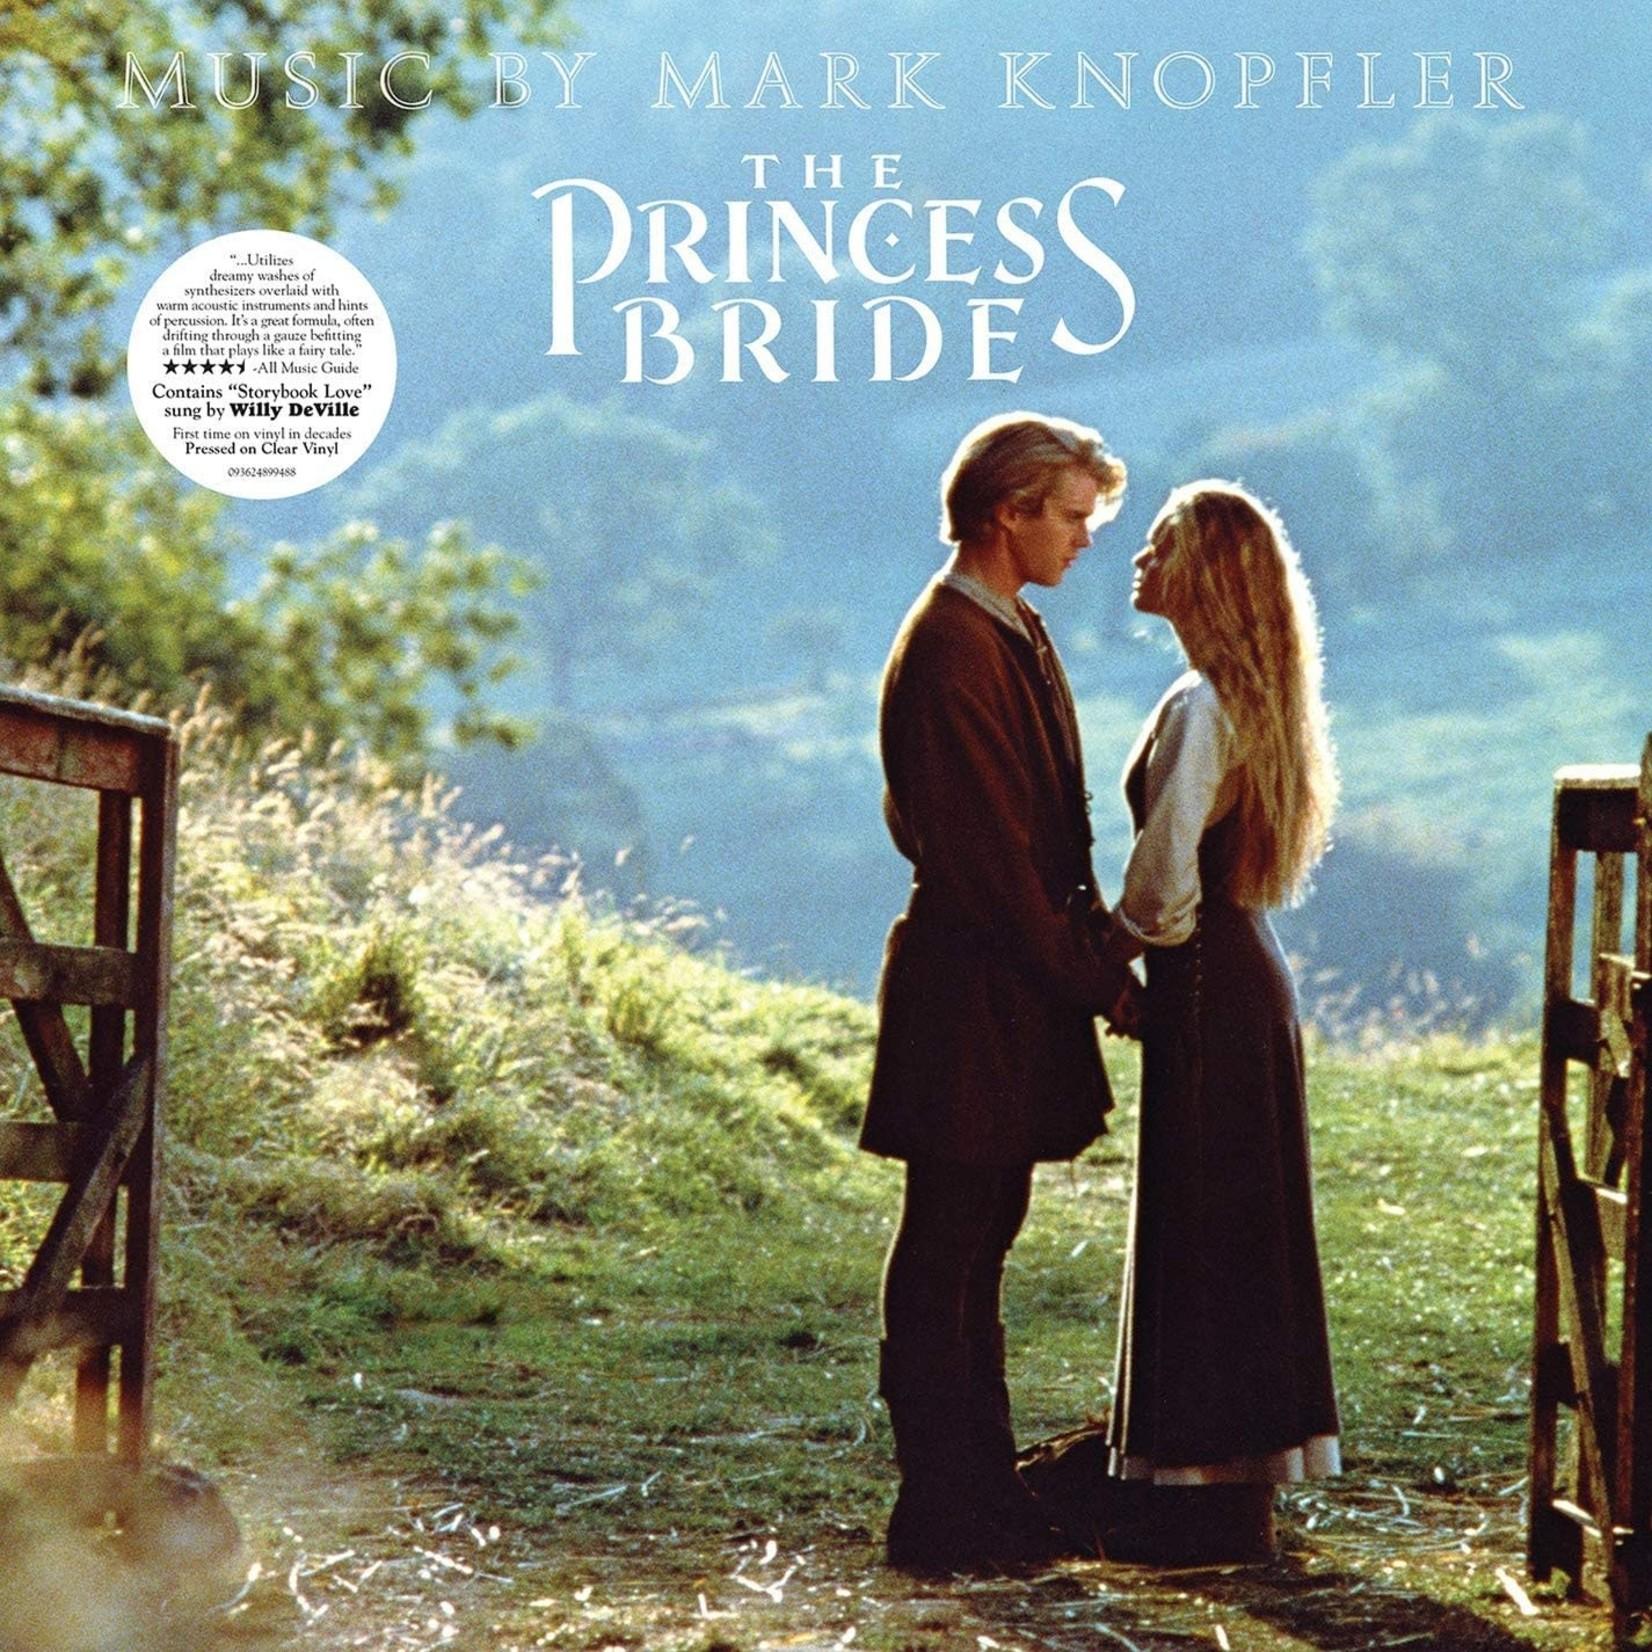 Soundtrack Mark Knoplfer - Princess Bride